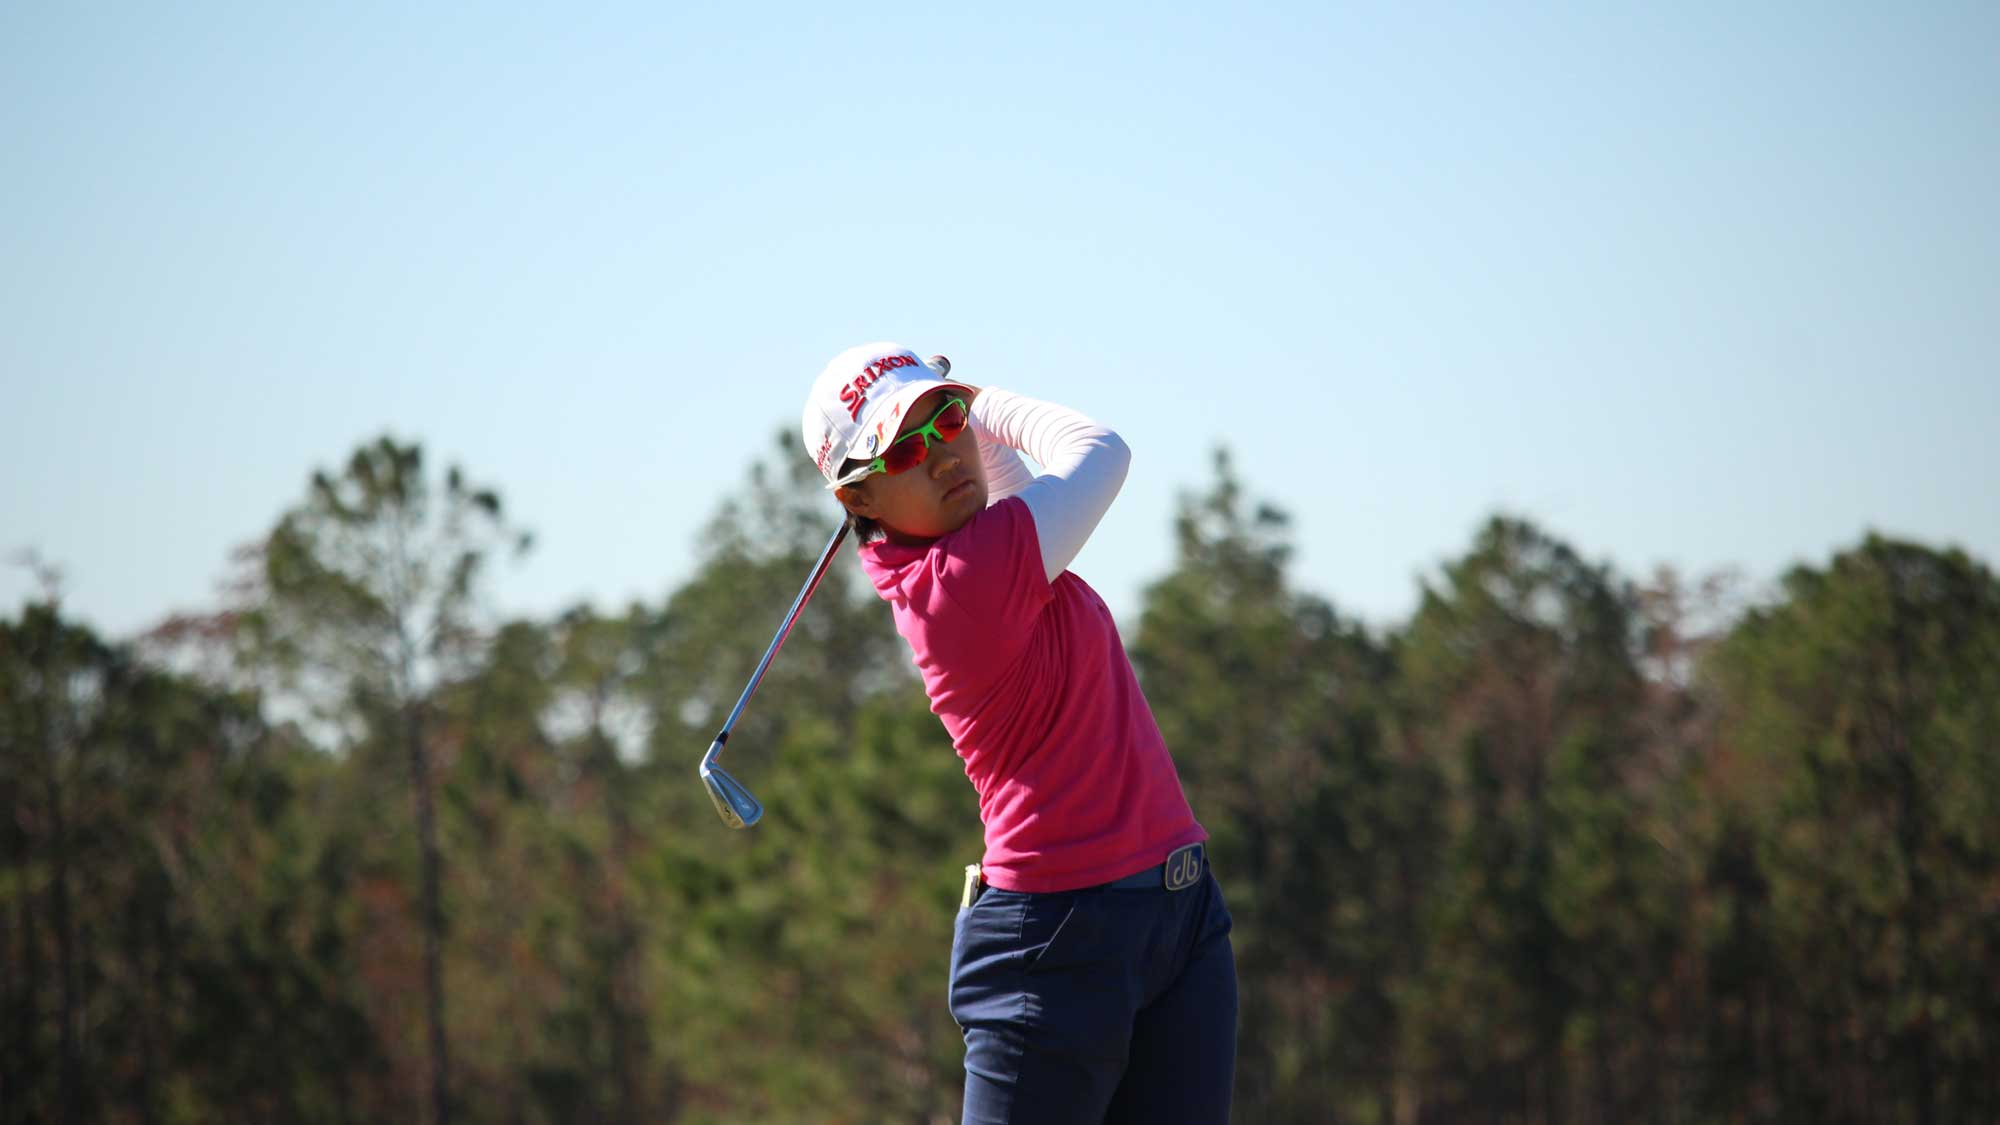 Former Washington golfer Sadena Parks earns LPGA Tour Card